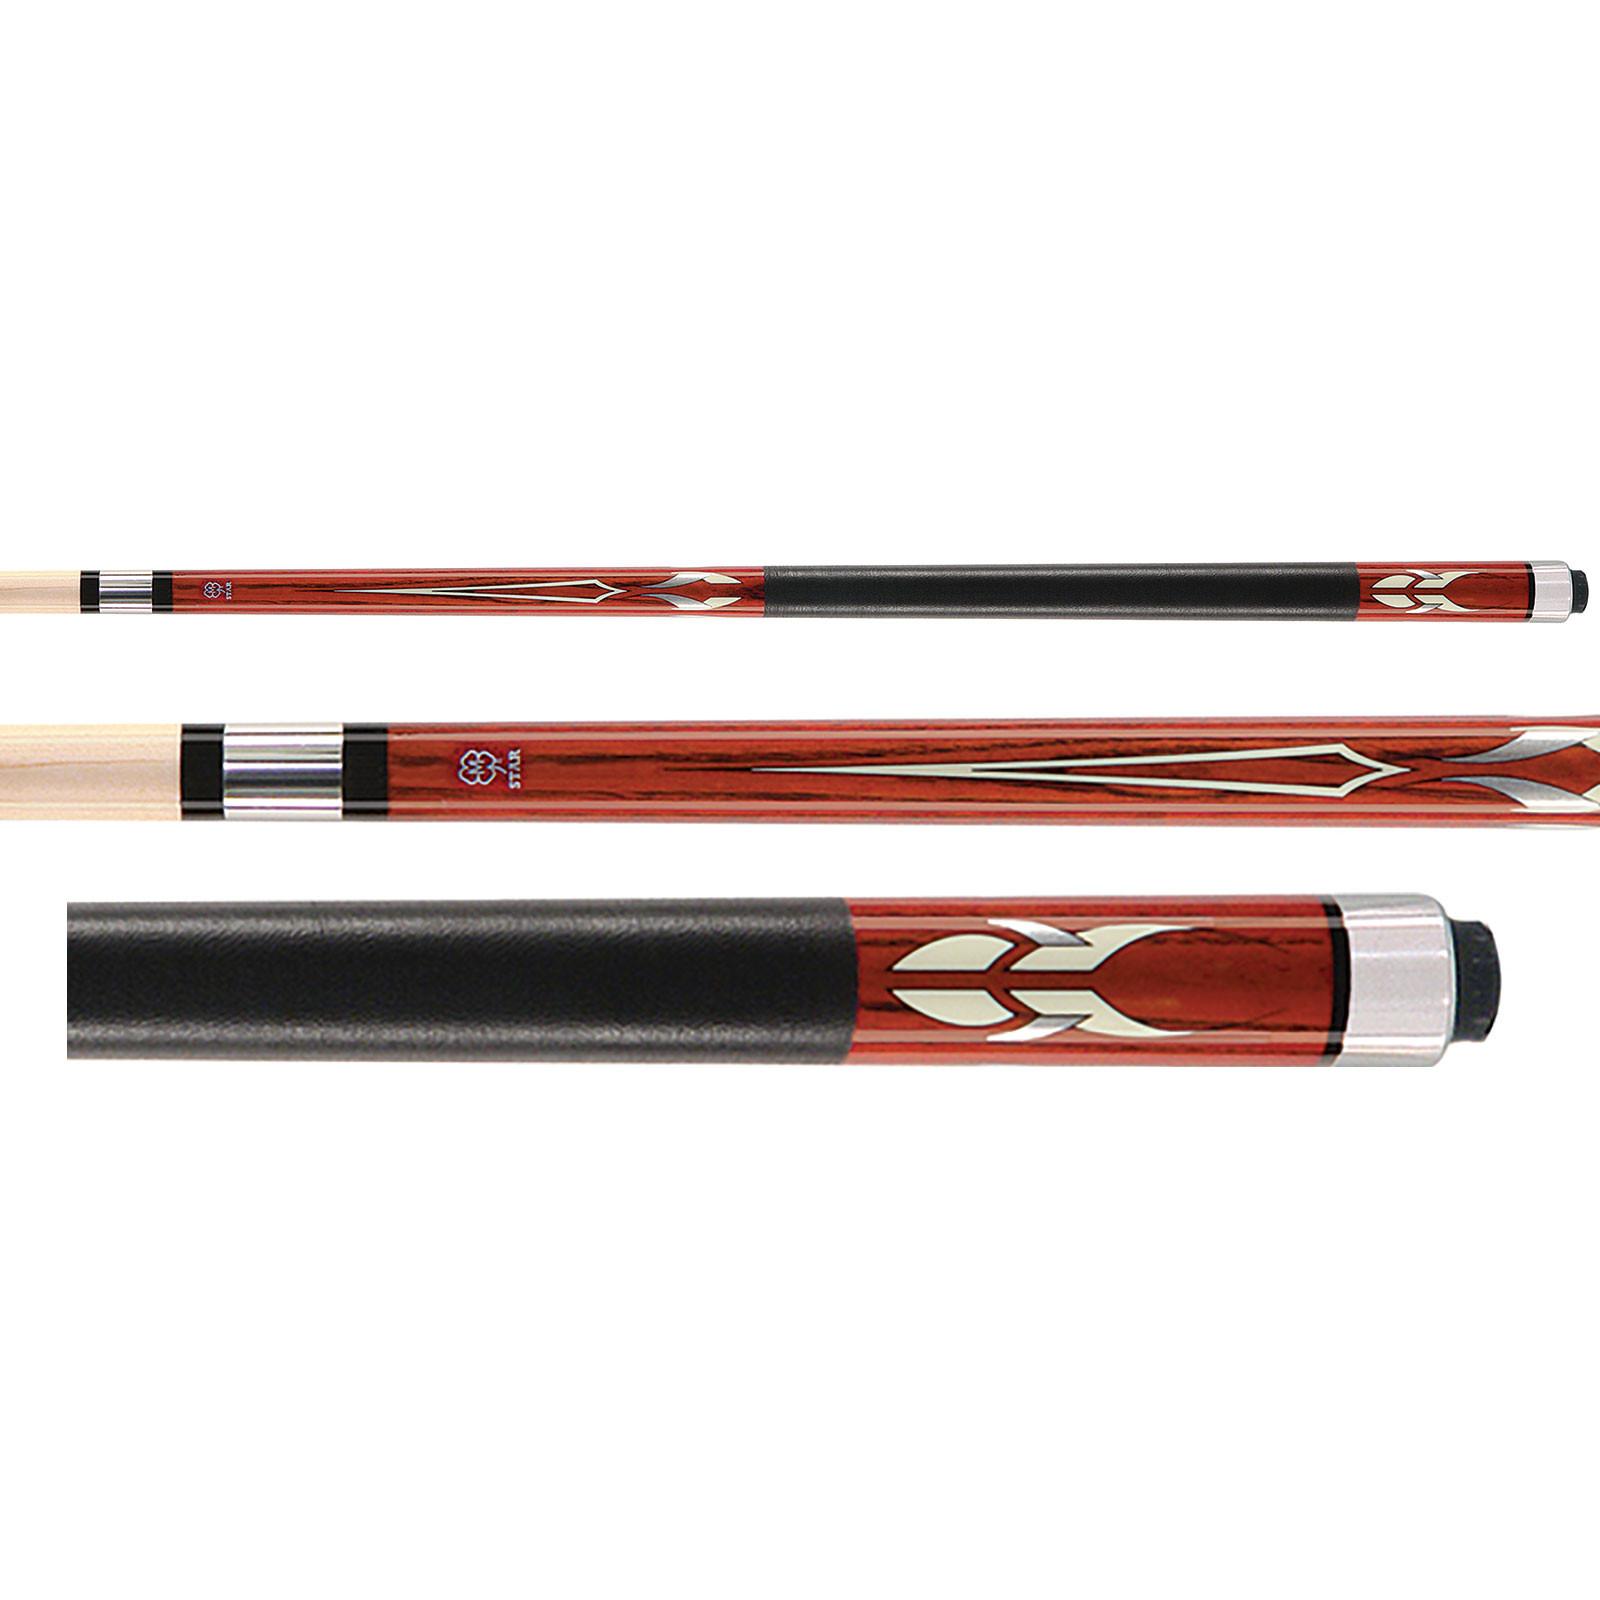 McDermott Star S55 Exotic Billiards Pool Cue Stick